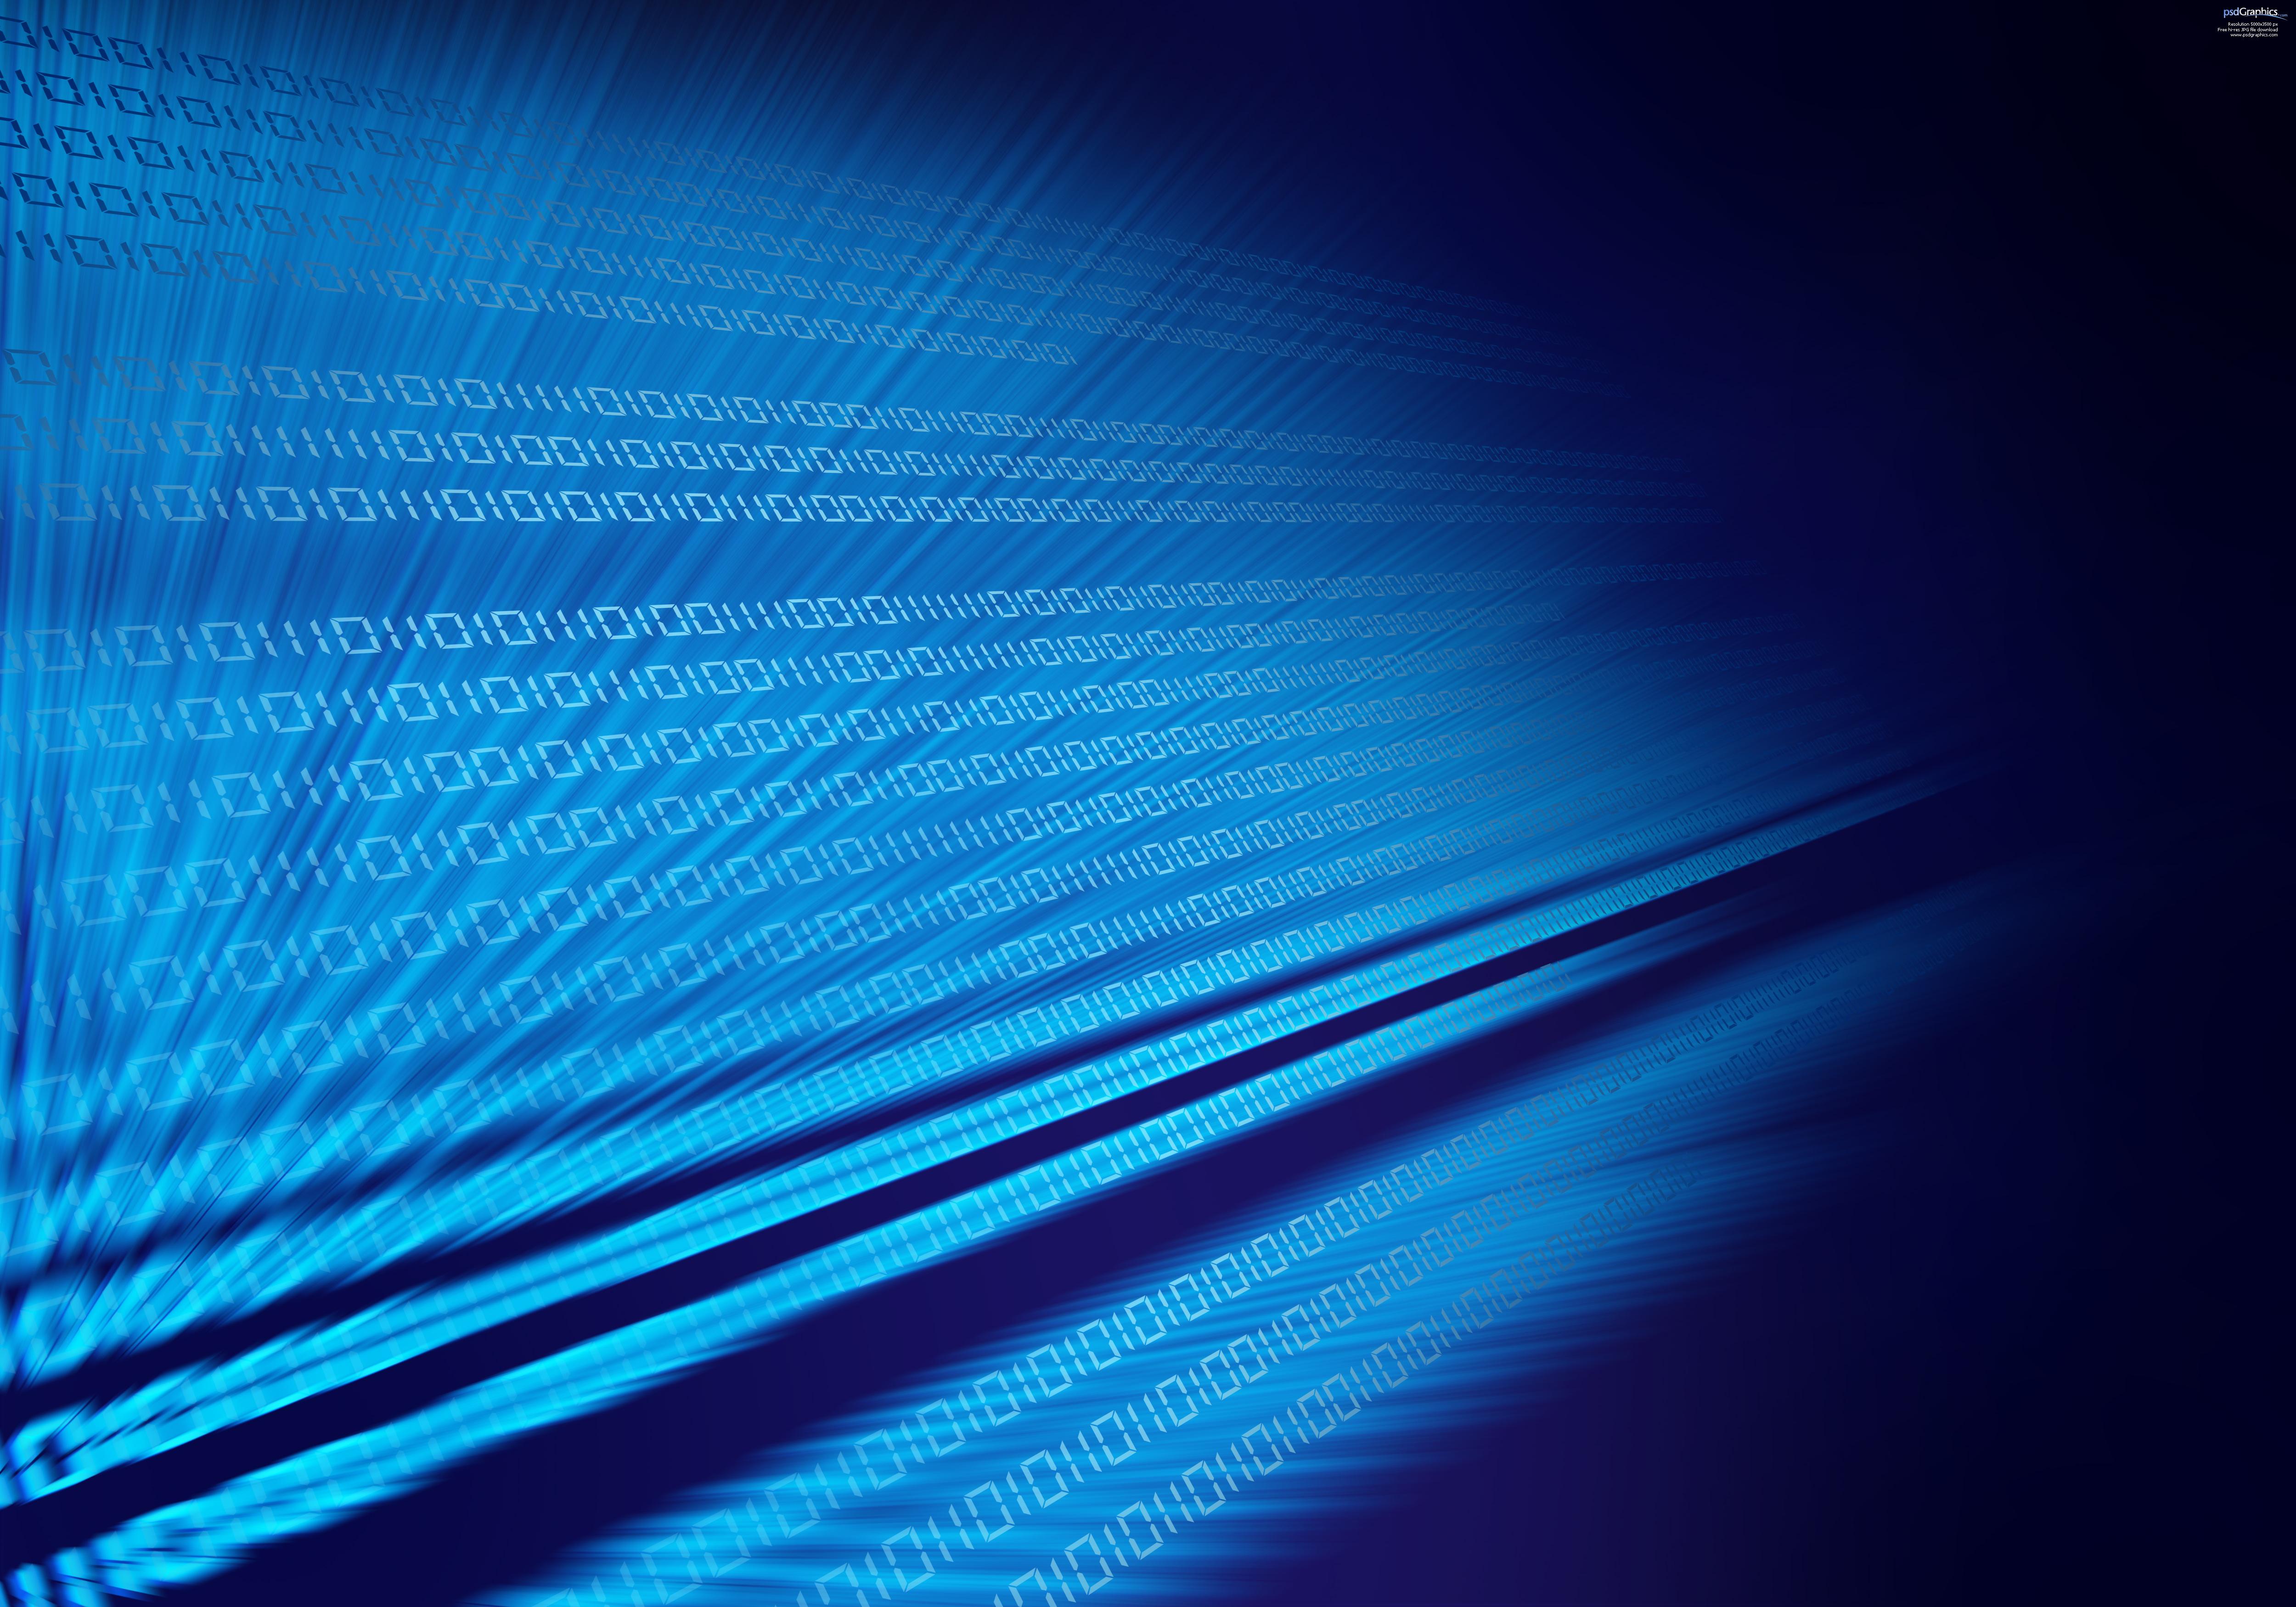 Blue binary code digital background PSDGraphics 5000x3500